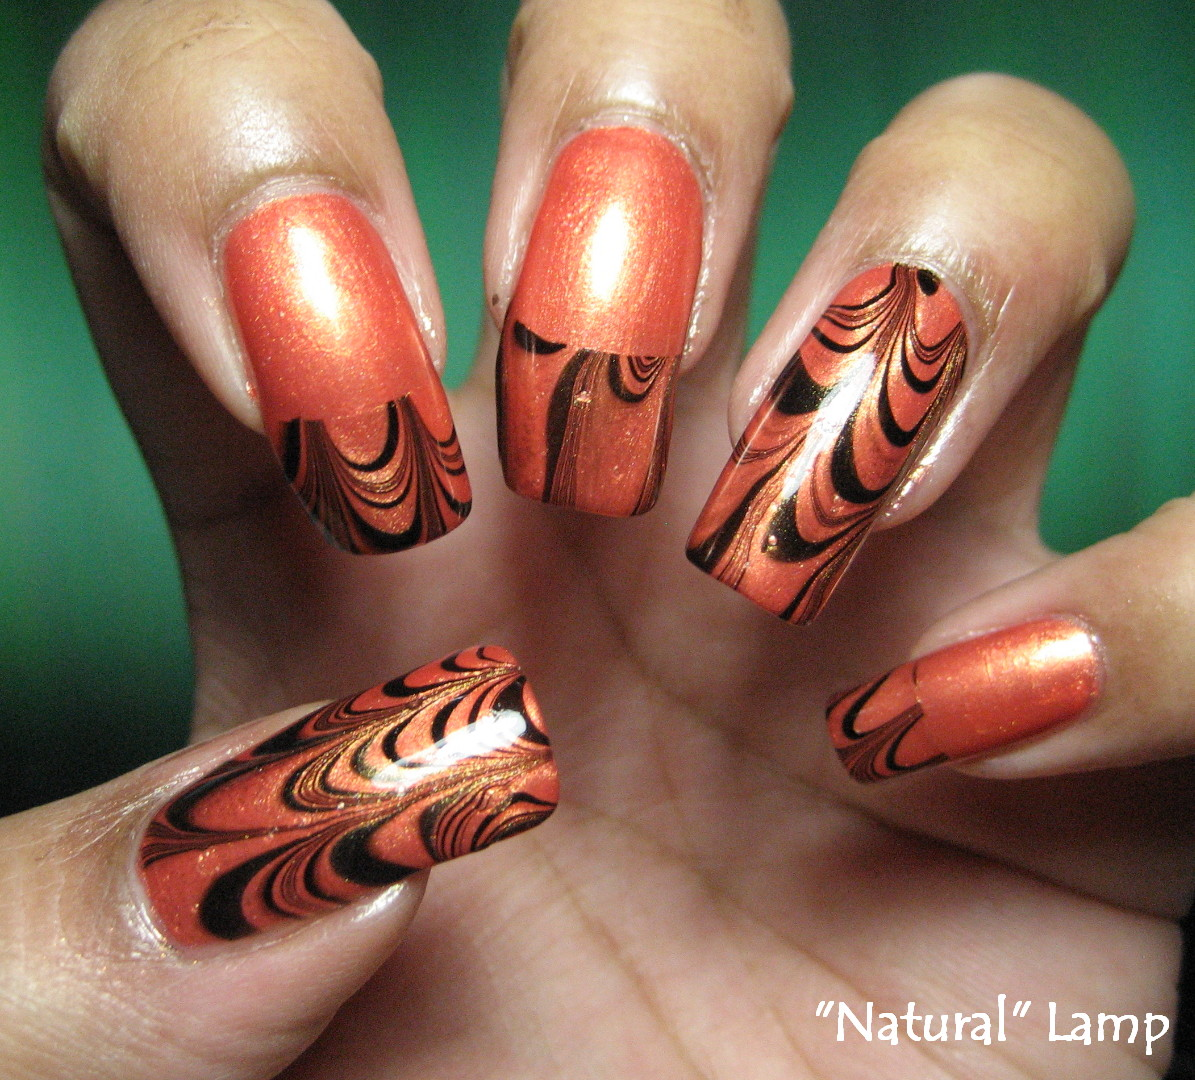 My Simple Little Pleasures: NOTD: Halloween Orange & Black French ...